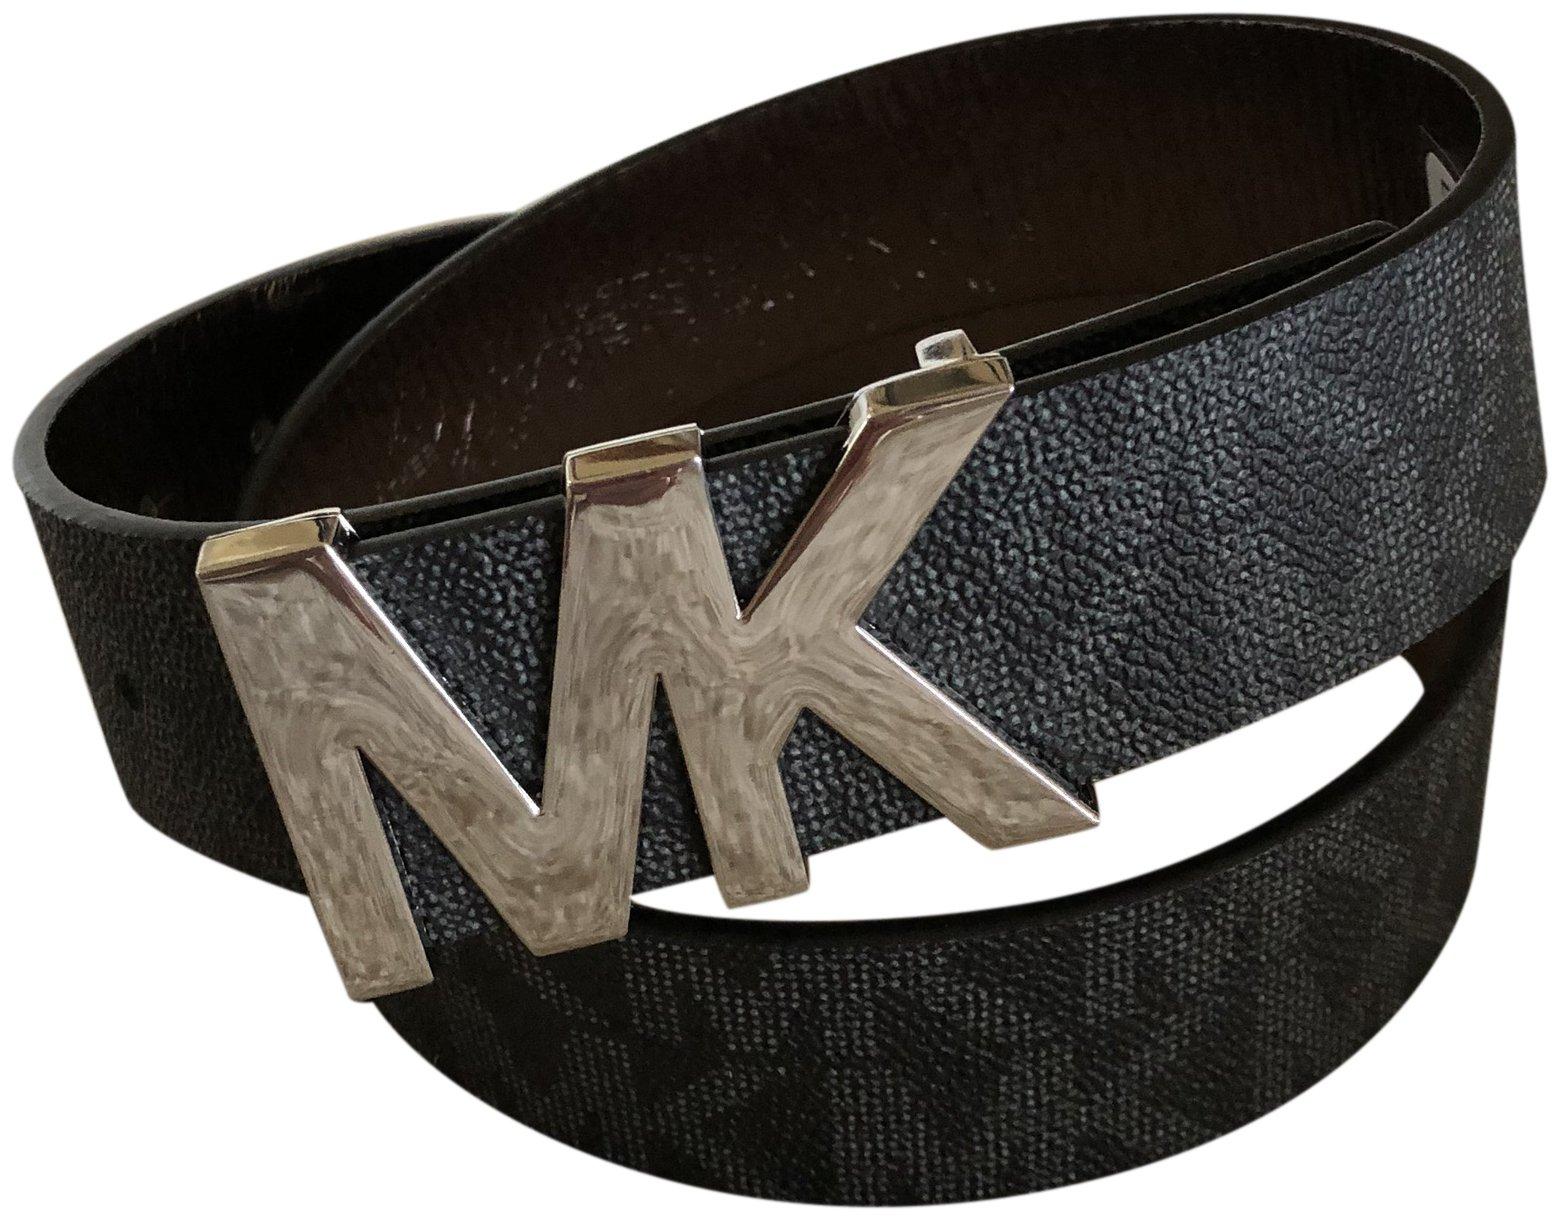 Michael Kors Womens Belt, Signature Logo Wide Belt – Black